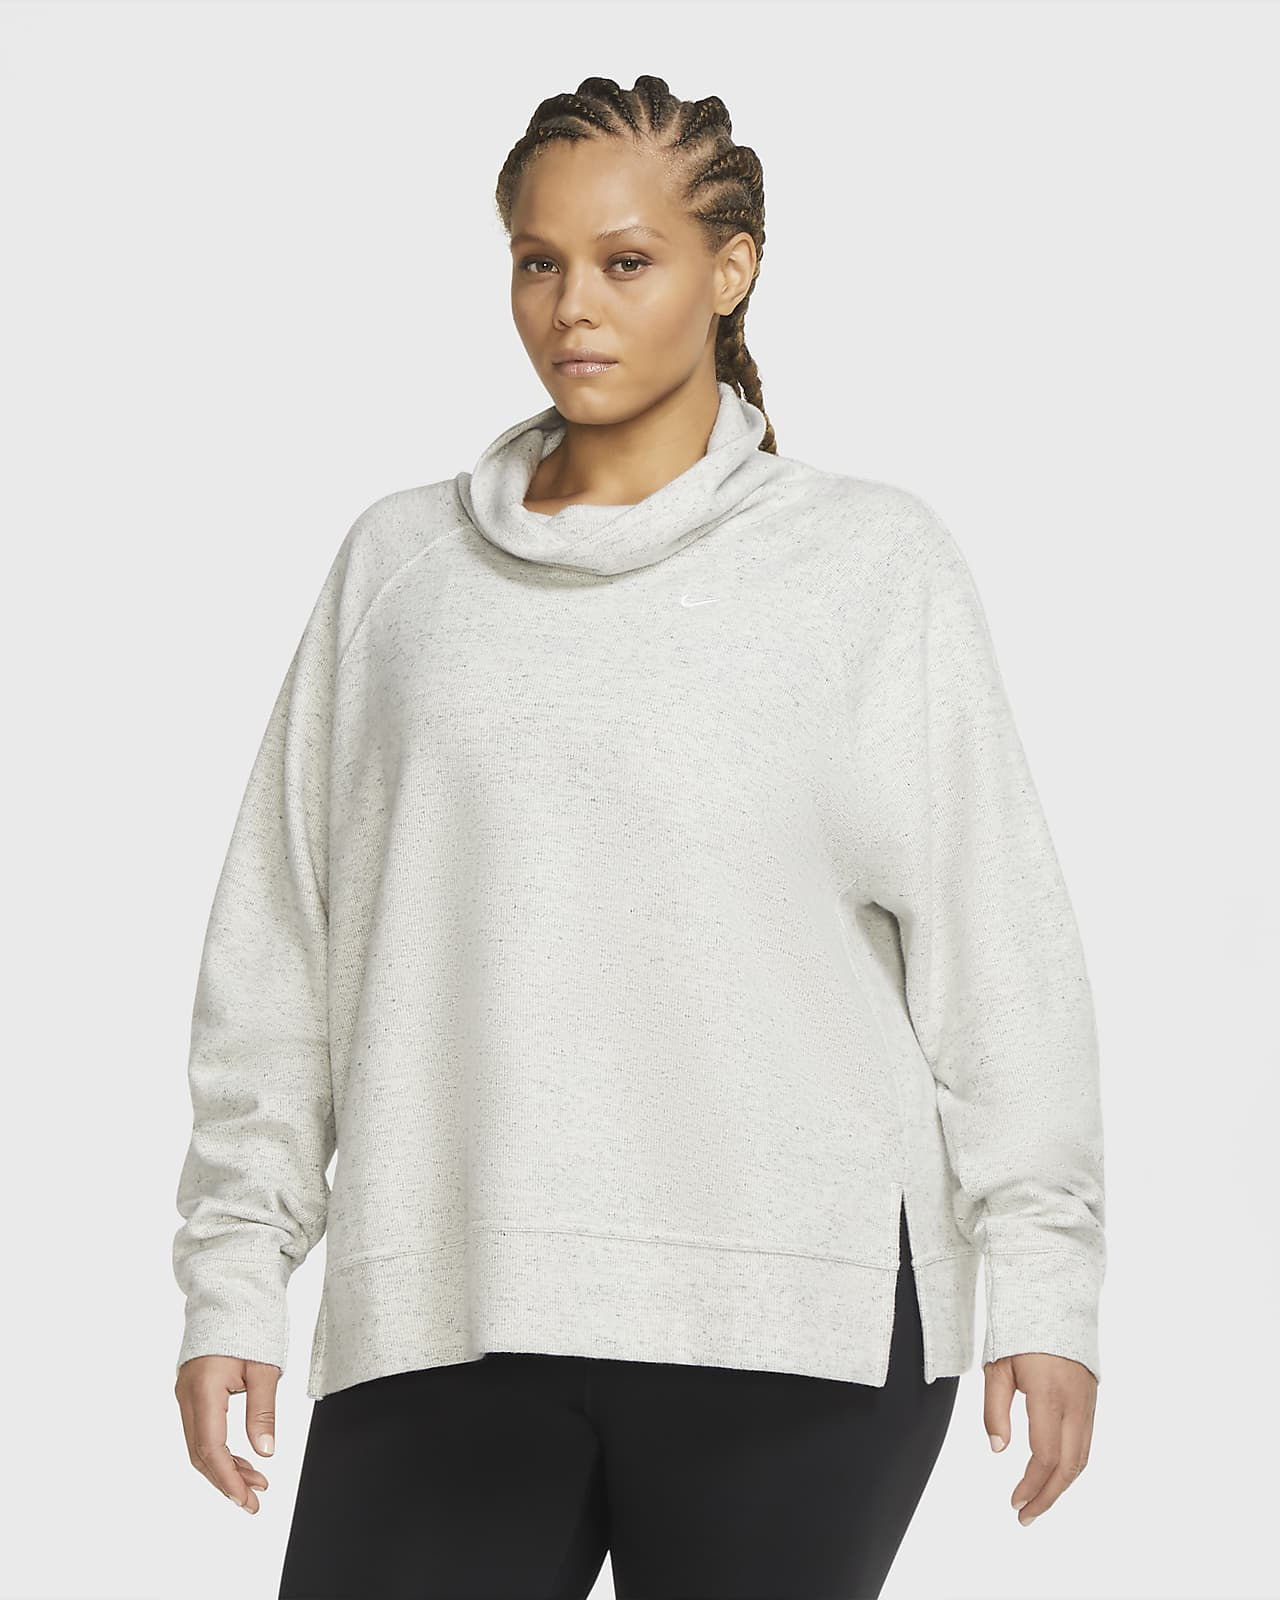 Nike Therma Women's High-Neck Fleece Training Top (Plus Size)